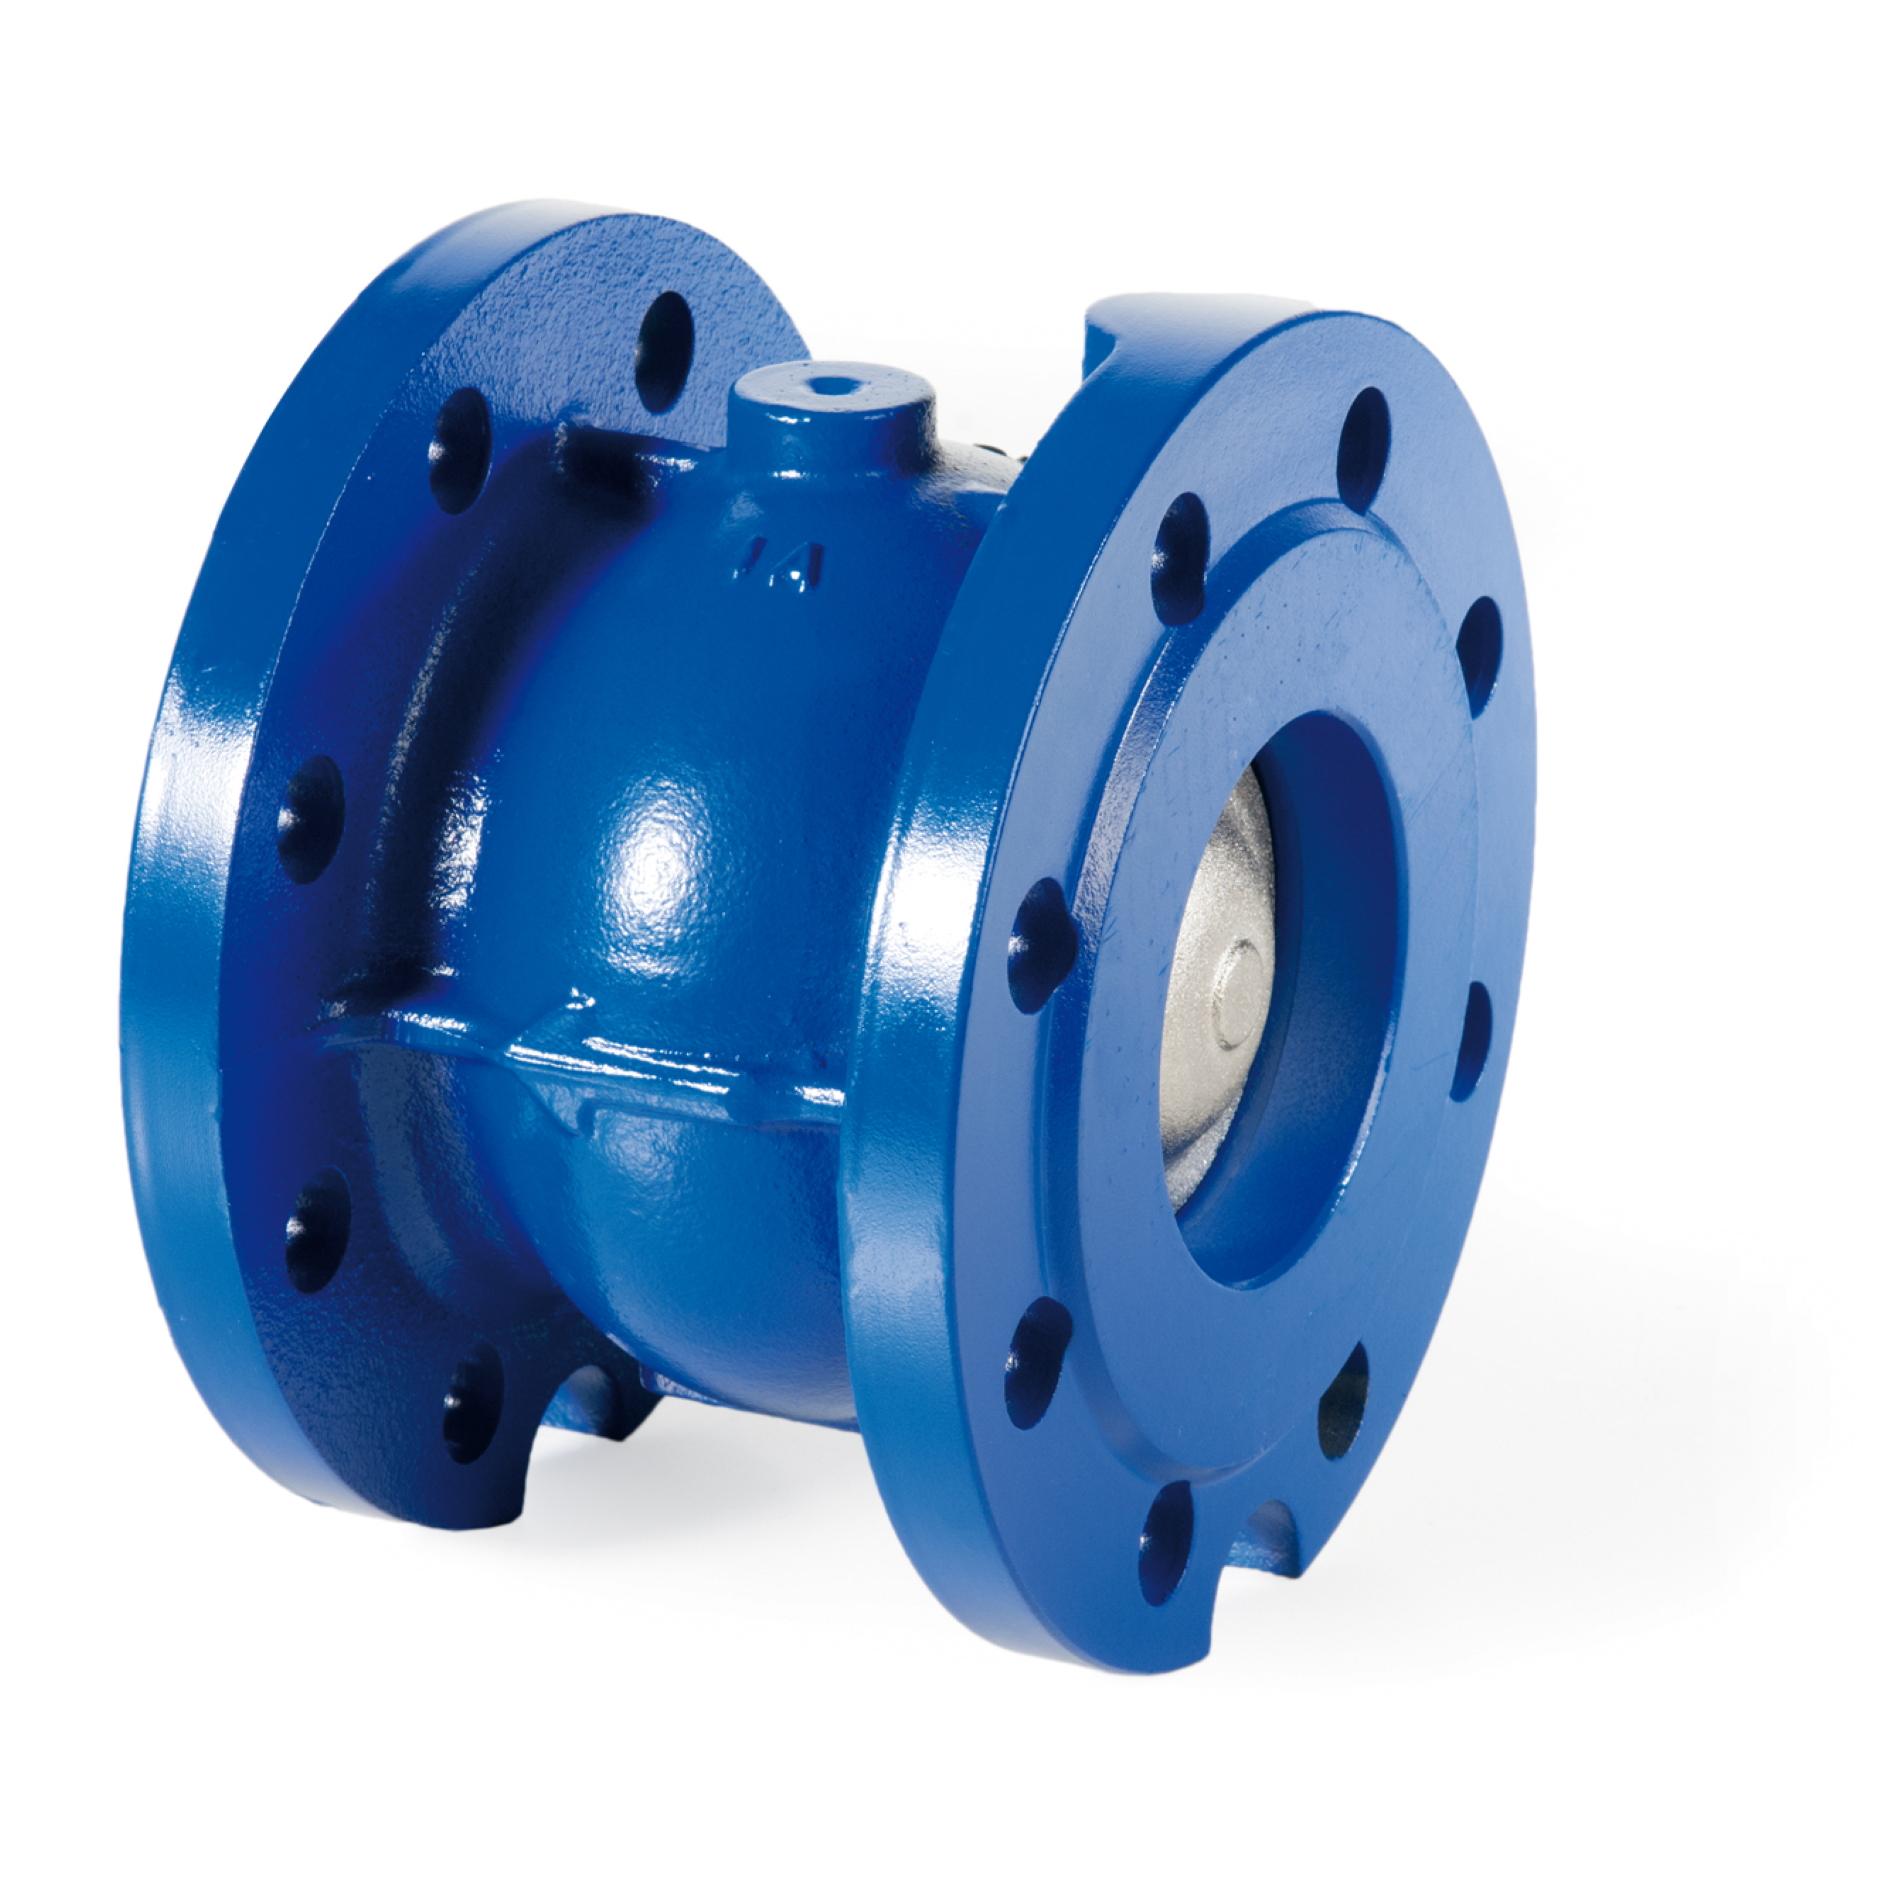 480GH Valvola di non ritorno ghisa flangiata orizzontale e verticale NRV Cast iron flanged non-return valve horizontal vertical type